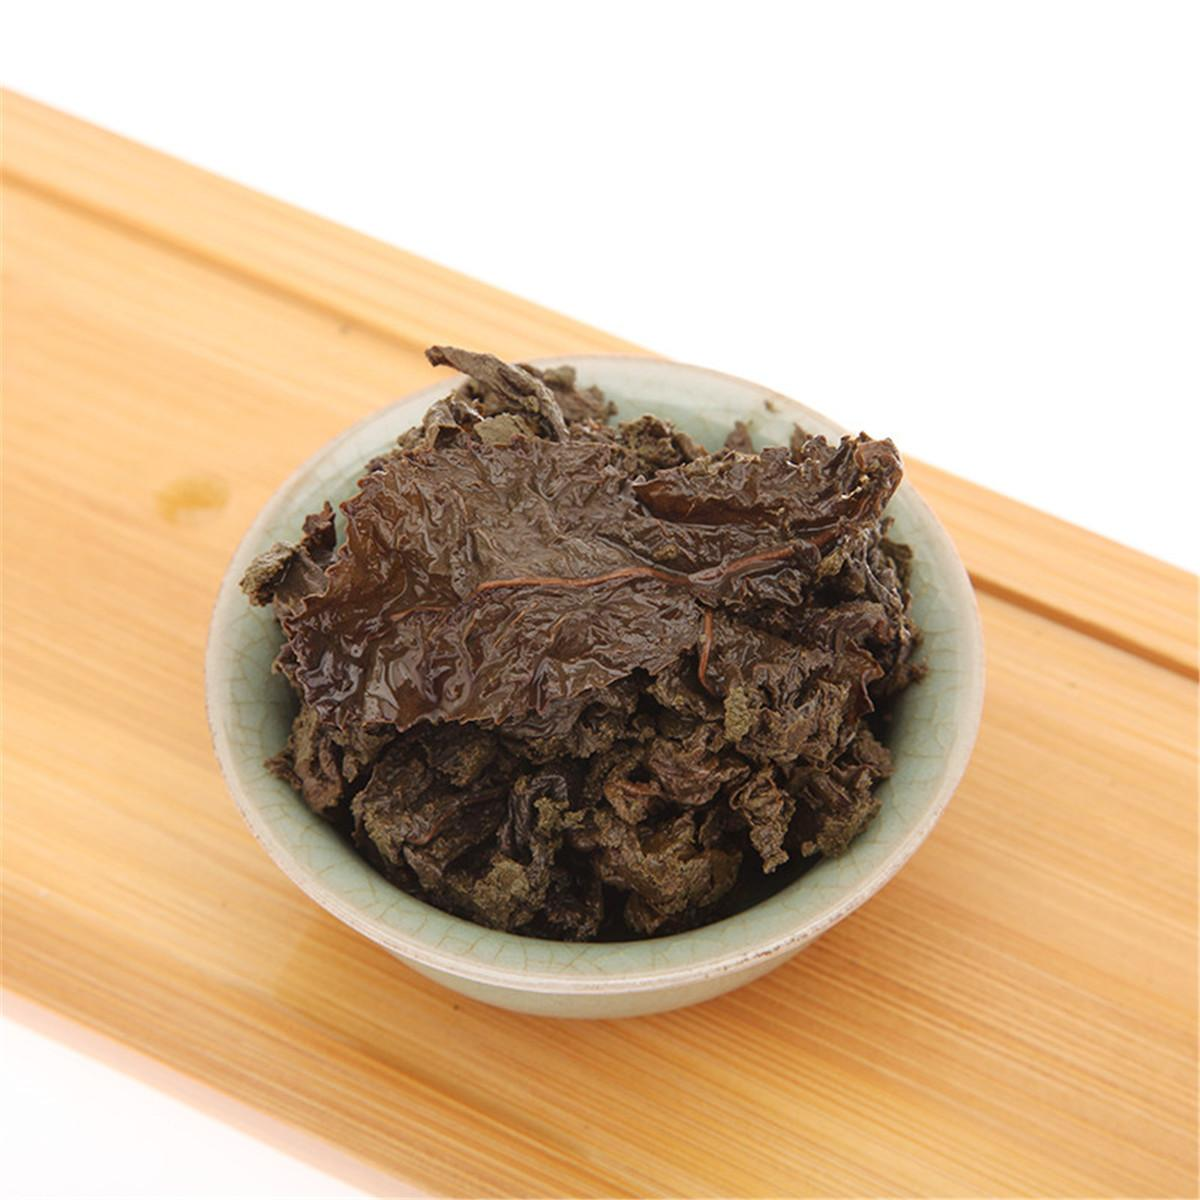 Sıcak satış ambalaj 250g Çin Organik Ginseng Oolong Çay Taze Doğal Güzellik Çay Yüksek Kalite Oolong Çay Vakum